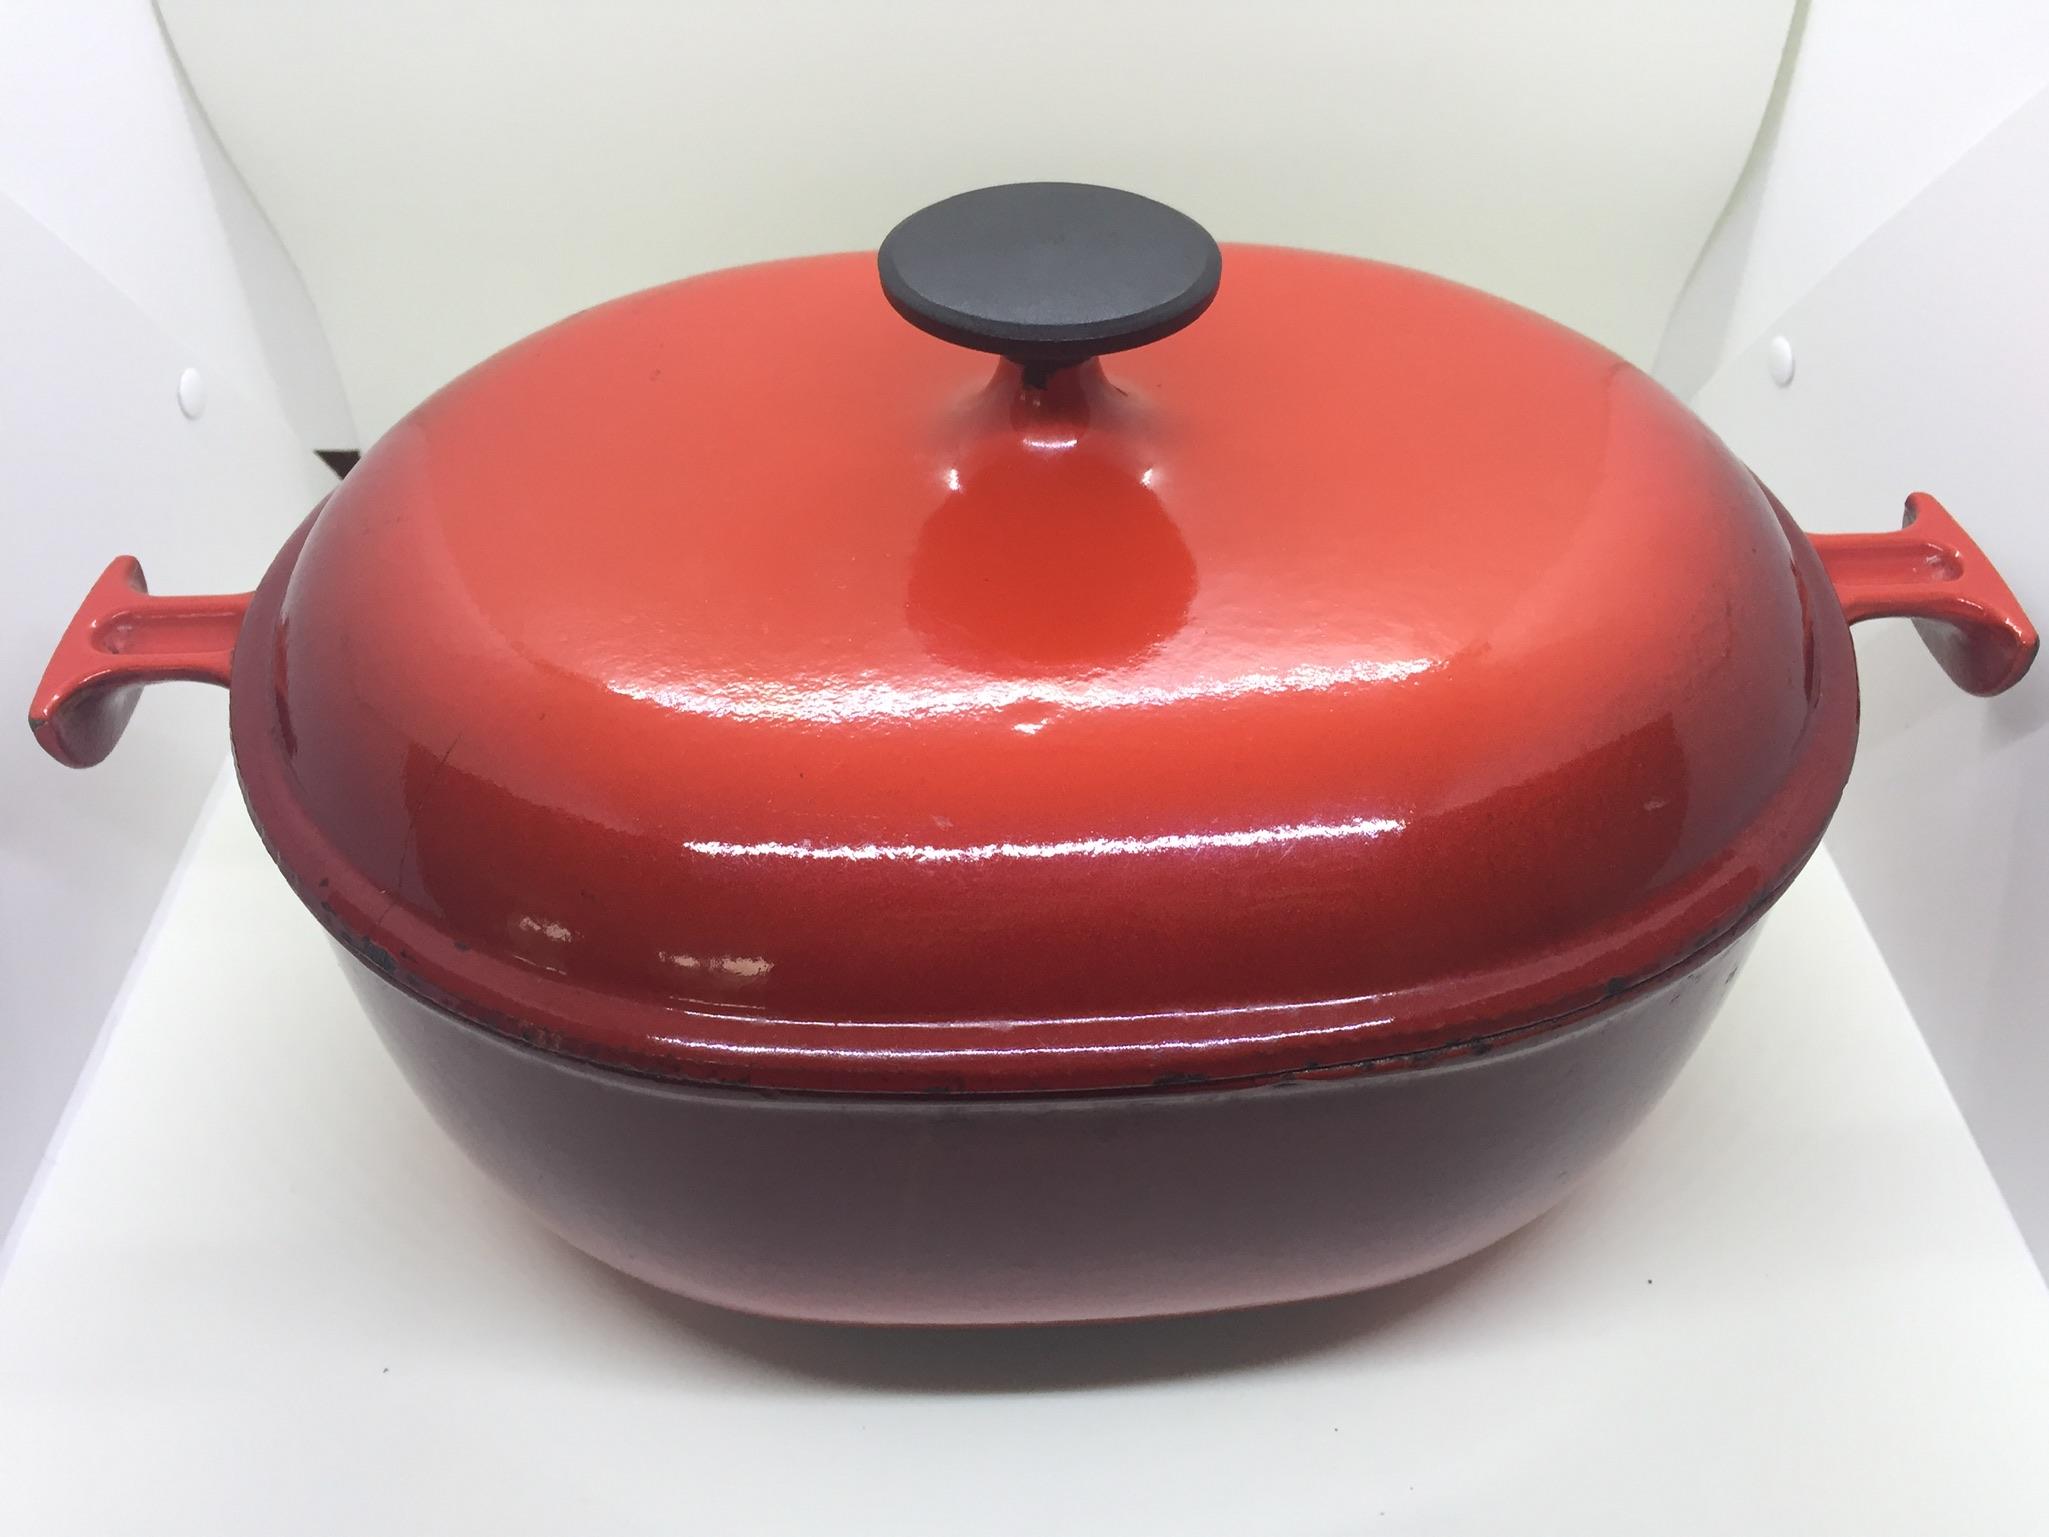 Heat a cast iron casserole dish